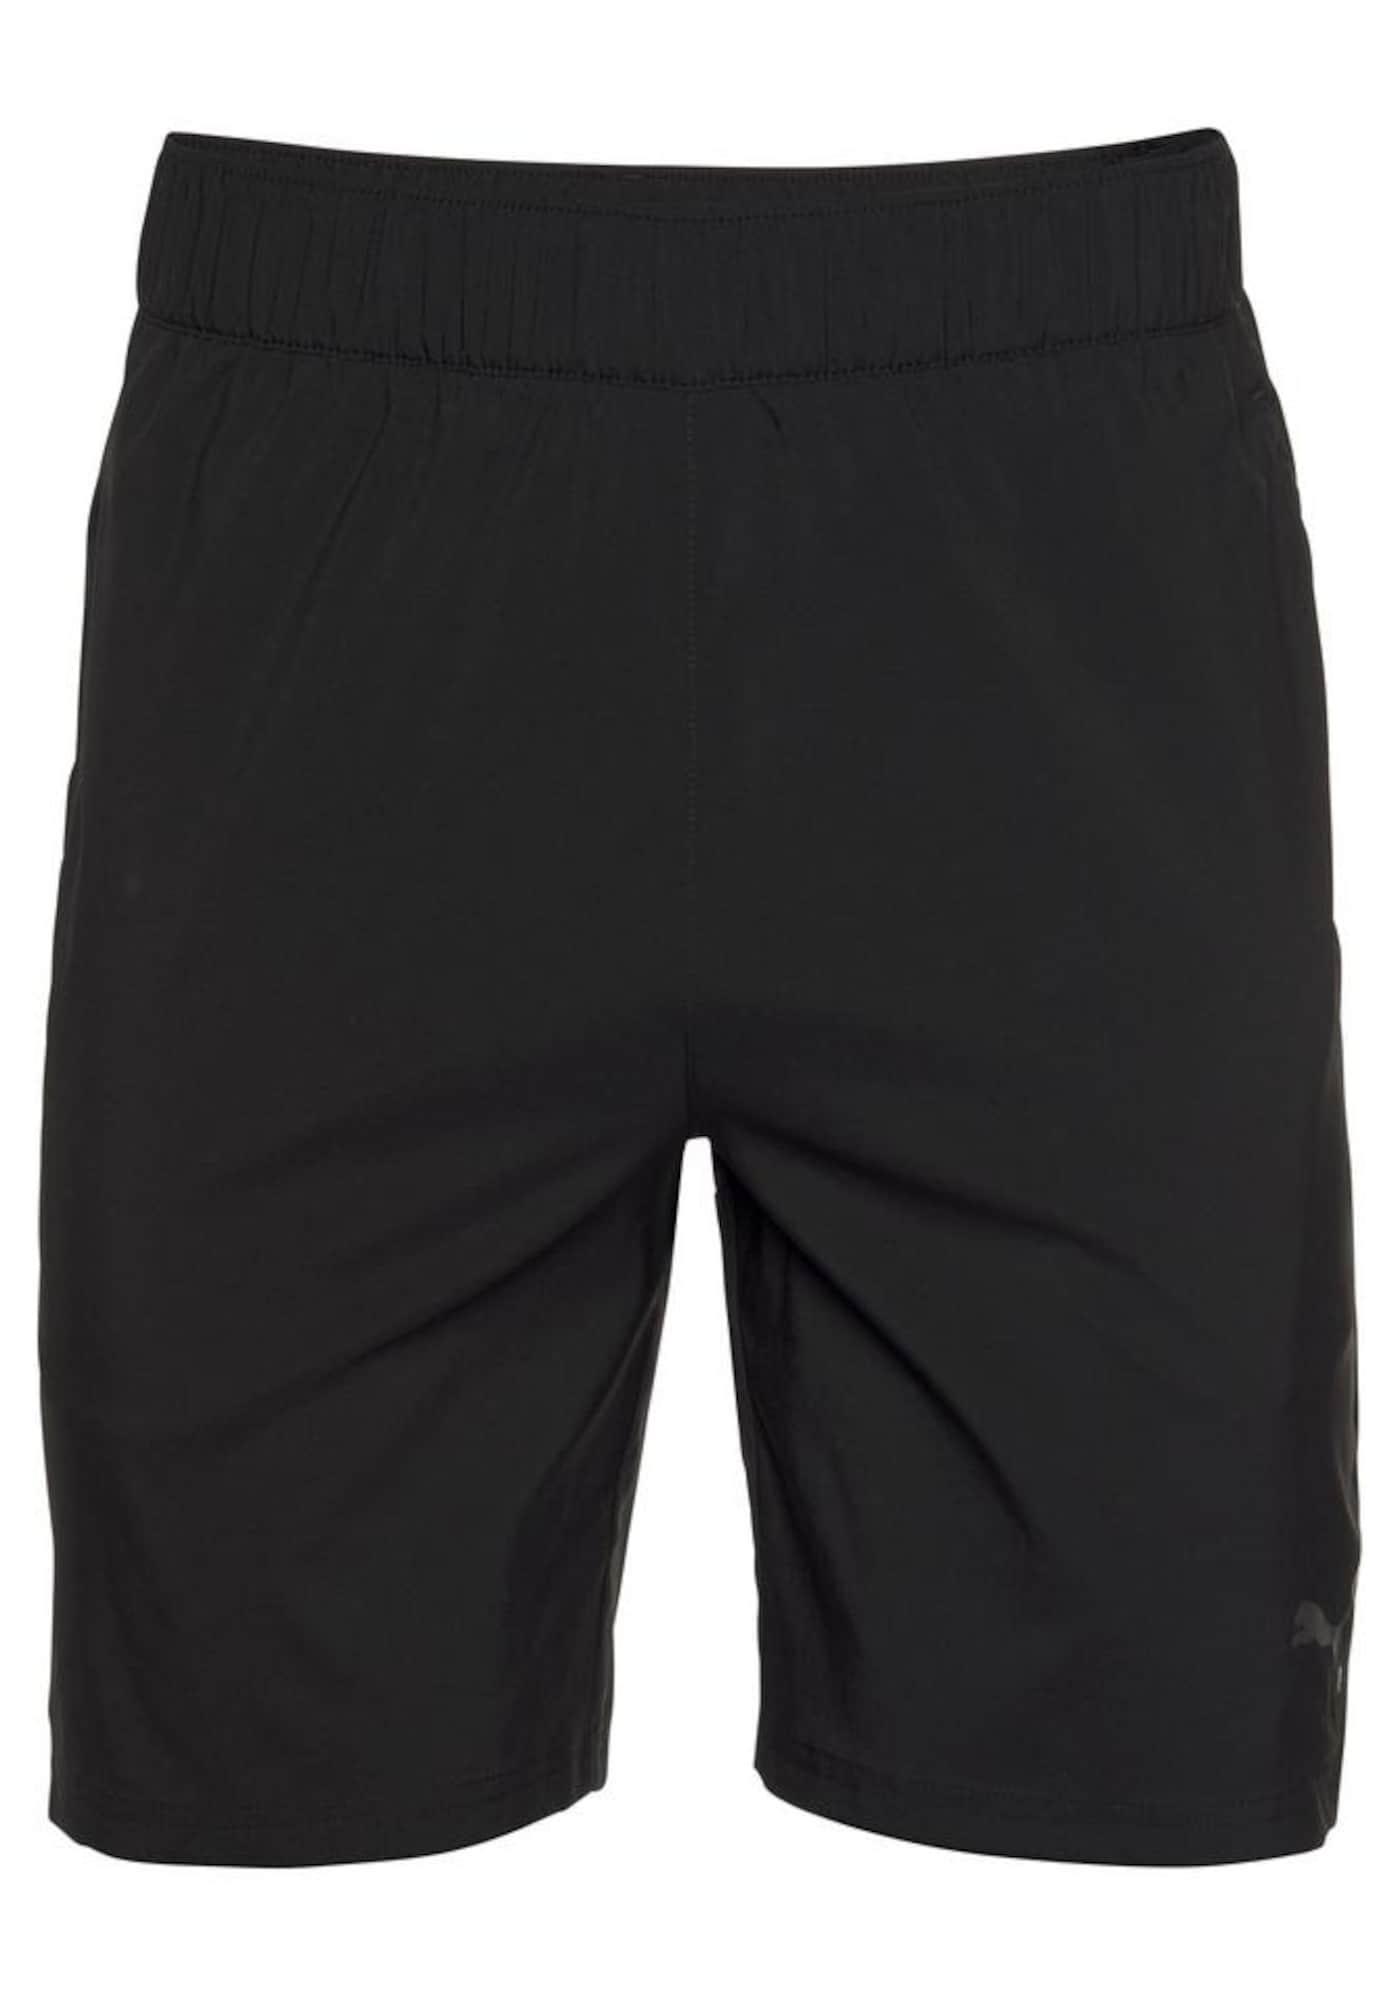 Sportshorts 'A.C.E. Woven Short' | Sportbekleidung > Sporthosen > Sportshorts | Schwarz | Puma